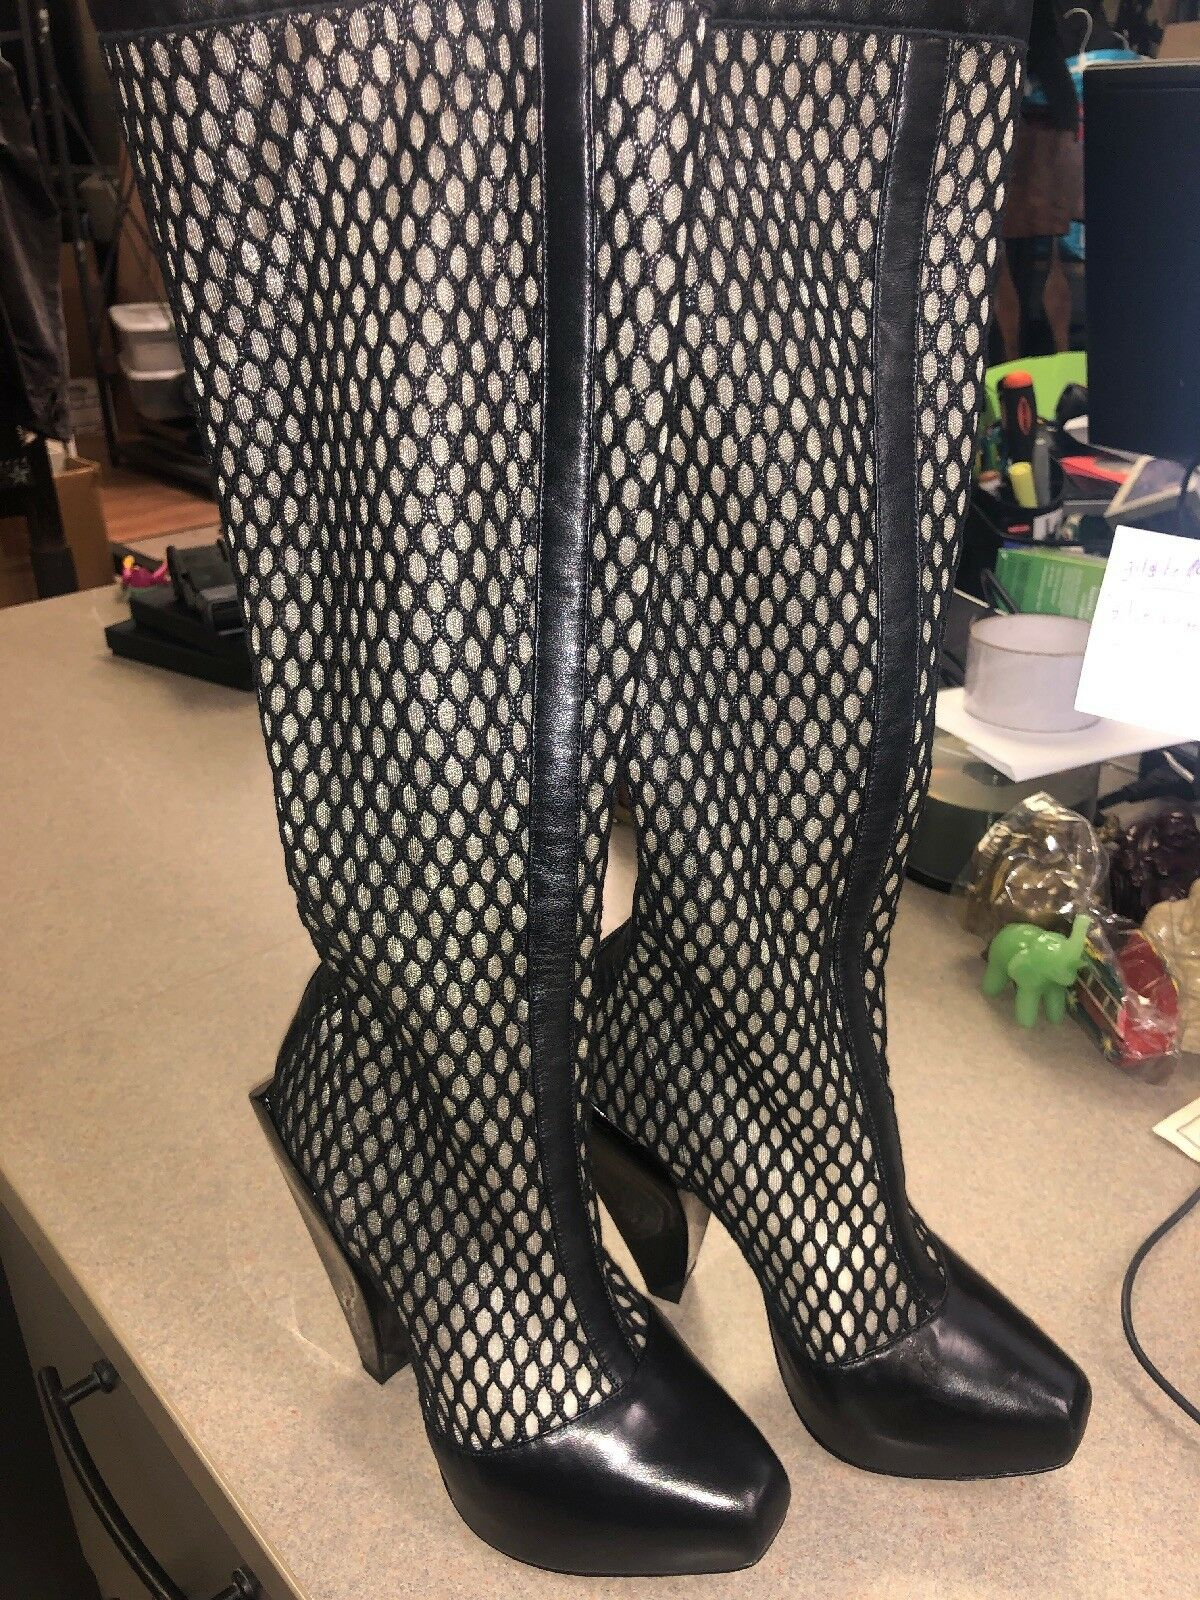 Versace Charol Charol Charol Negro botas Jaula de plataforma 35  ventas en linea